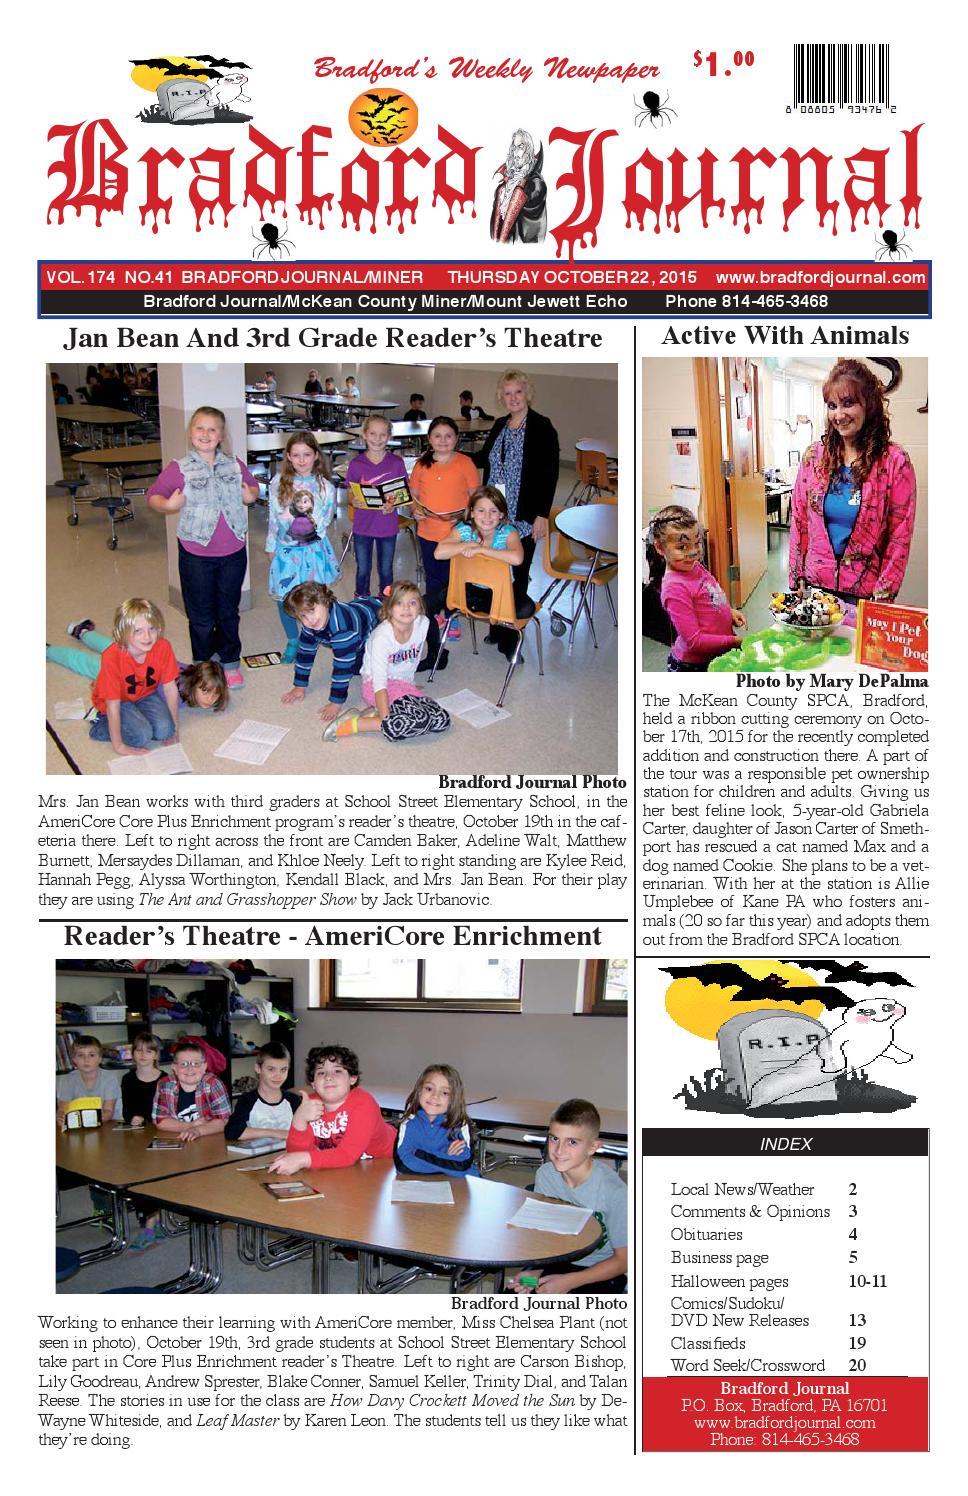 Bradfordjournalcolorissue10 22 15n by Bradford Journal - issuu